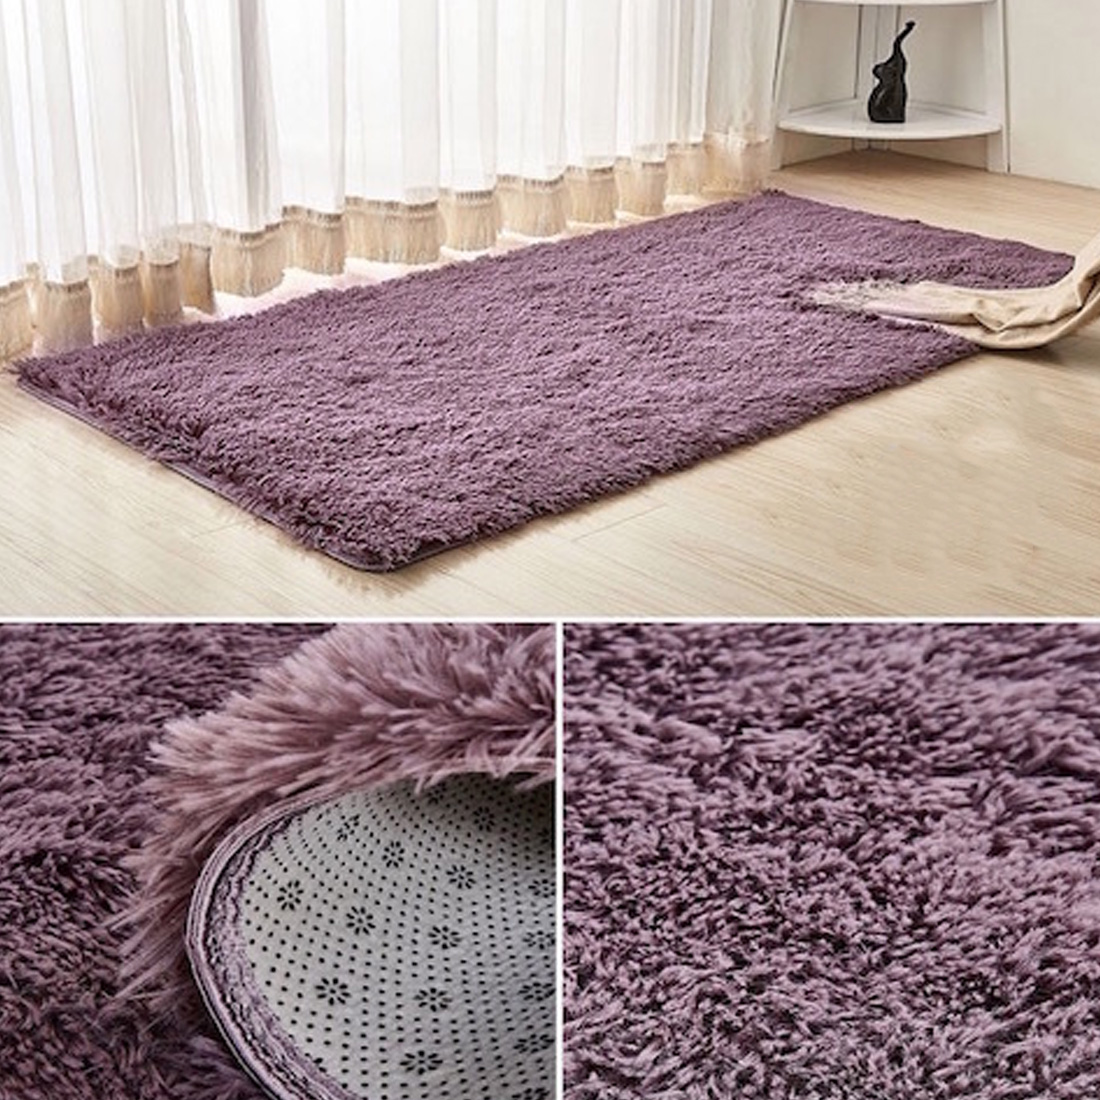 Living Room Mats European Home Warm Plush Floor Rugs